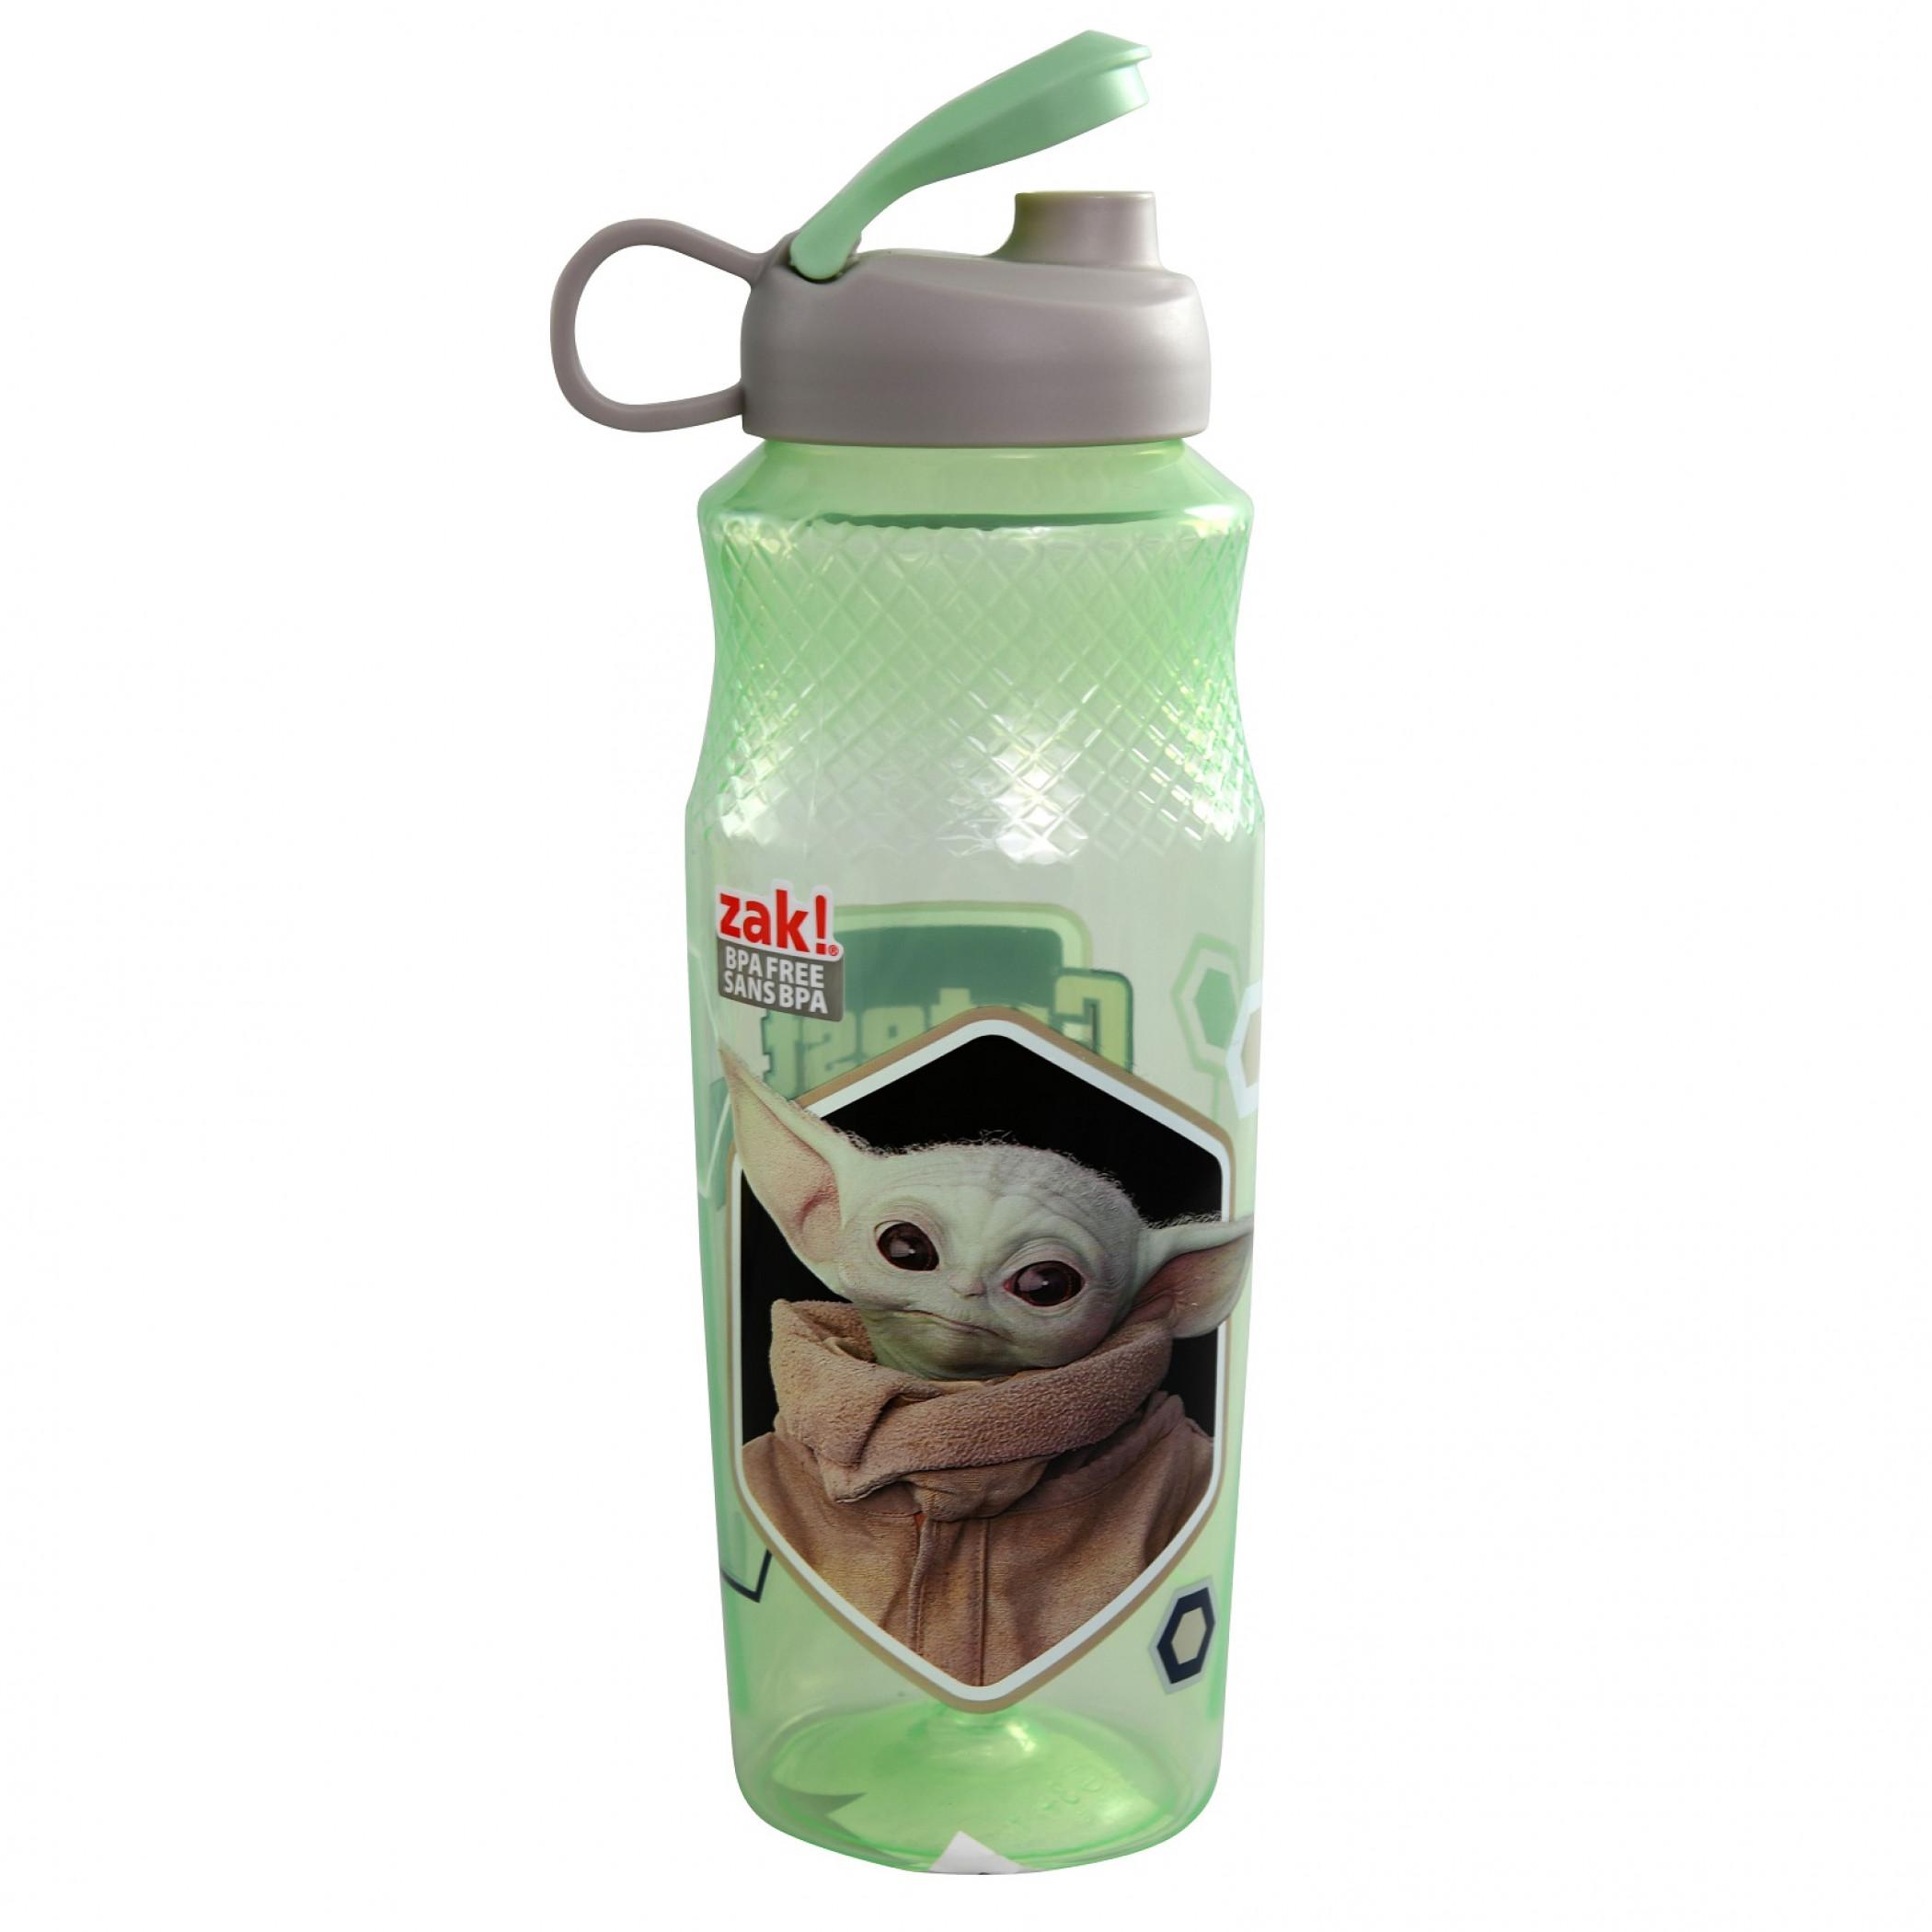 Star Wars The Child 30oz Plastic Water Bottle